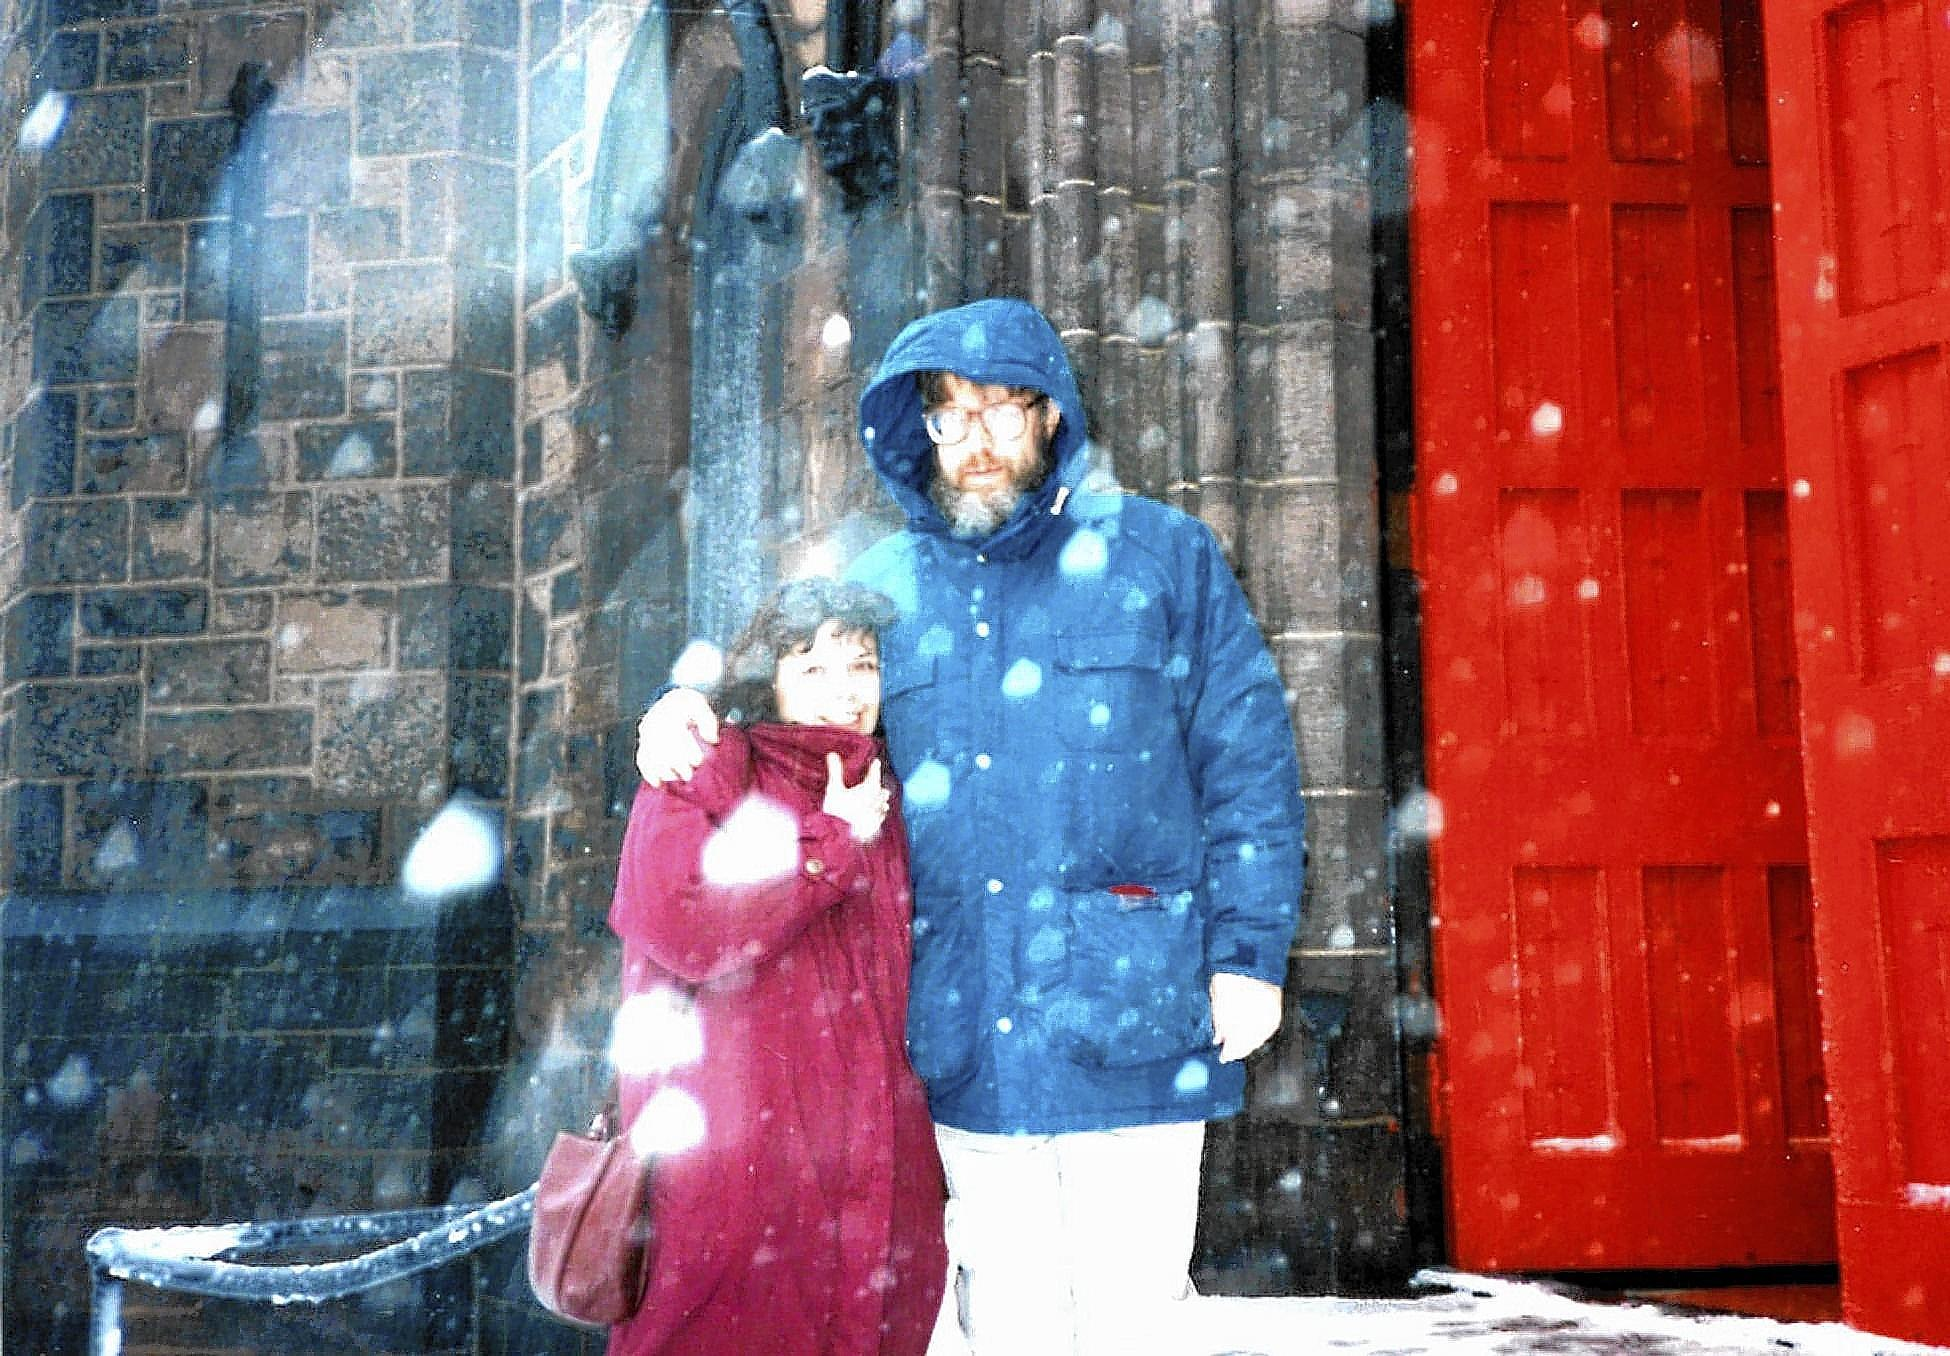 Linda Henry and Robert Phillips of Bethlehem stand outside Trinity Memorial Episcopal Church, Philadelphia, on their very snowy wedding day.